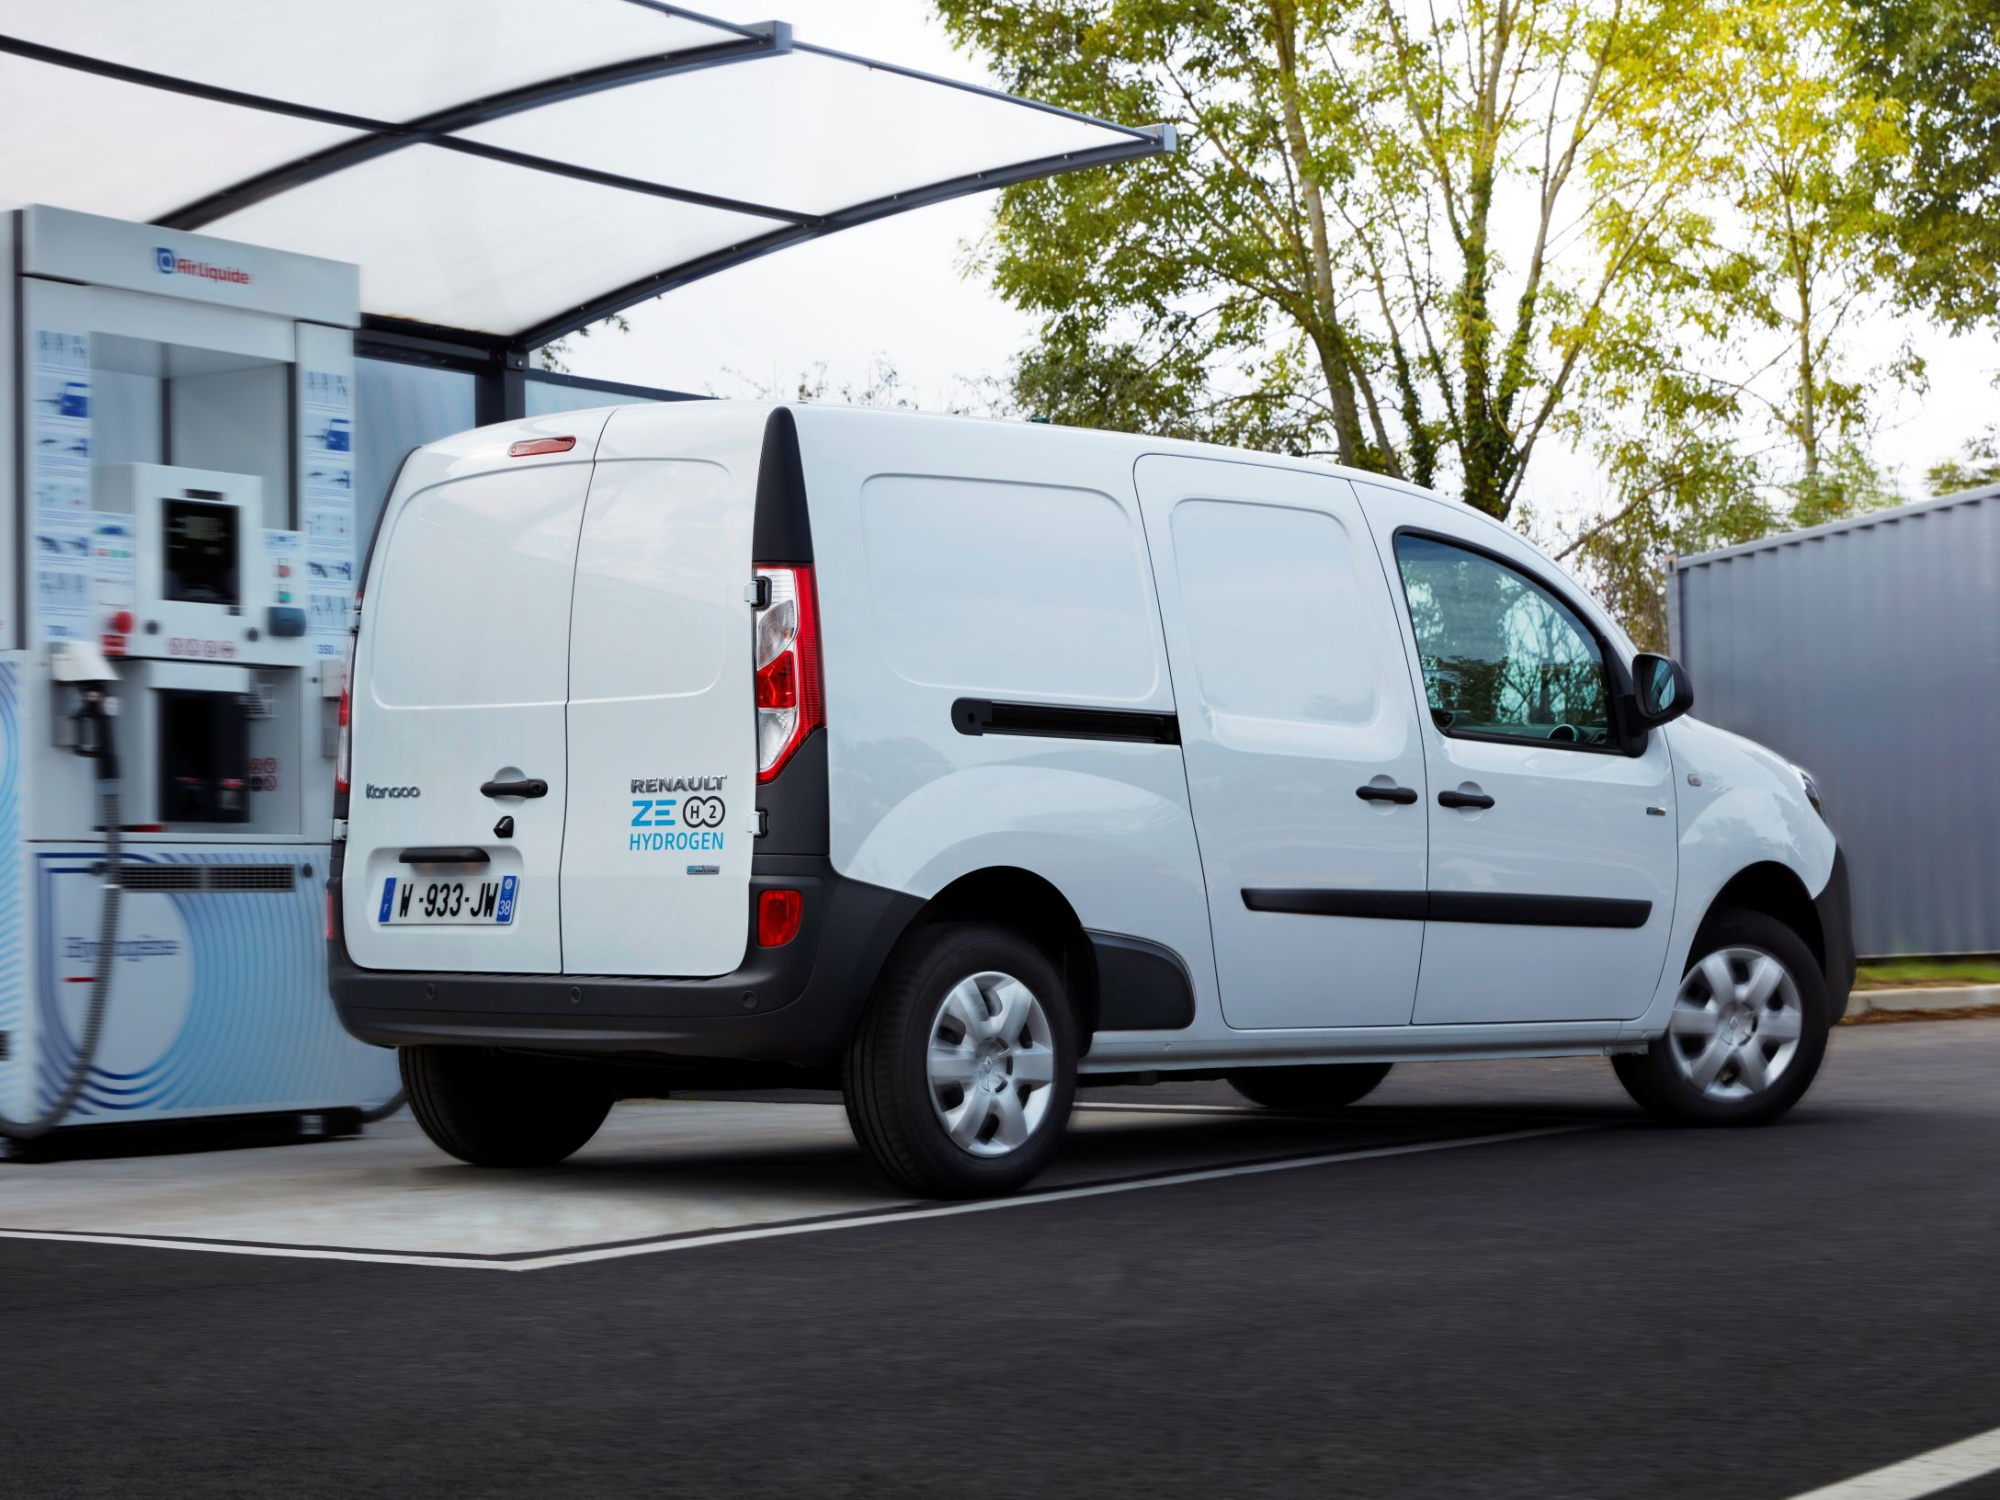 Renault Kangoo Hydrogen 1